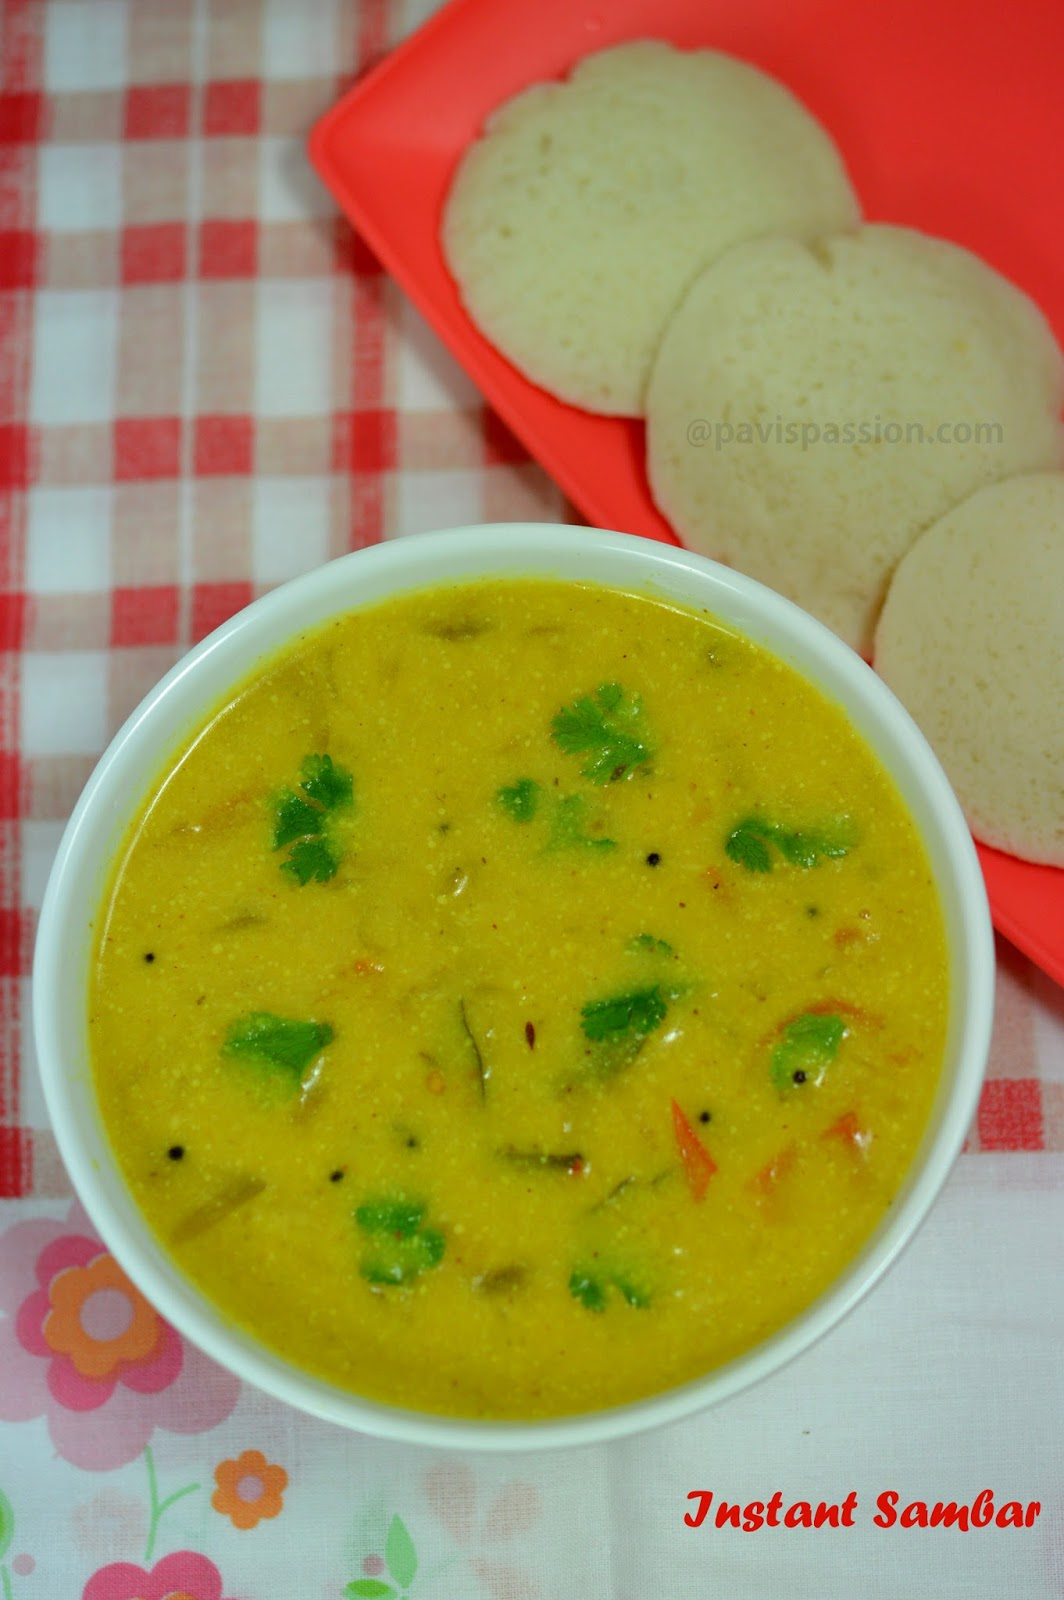 PavisPassionInstant Sambar Quick Sambar No pressure Cook Sambar